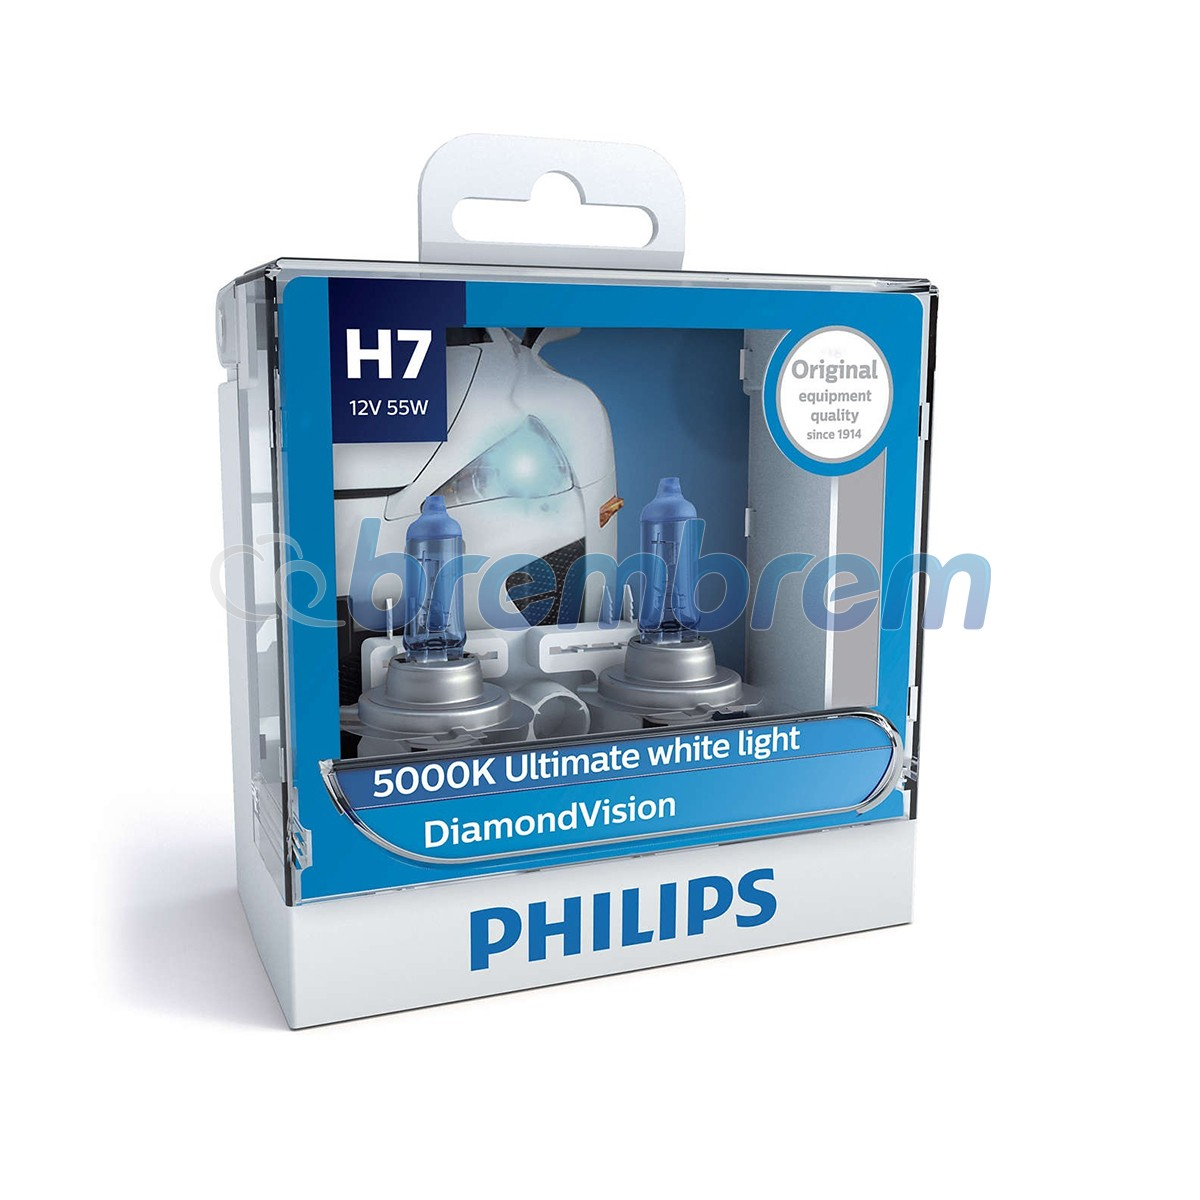 PHILIPS DIAMONDVISION H7 (5000K) - LAMPU HALOGEN